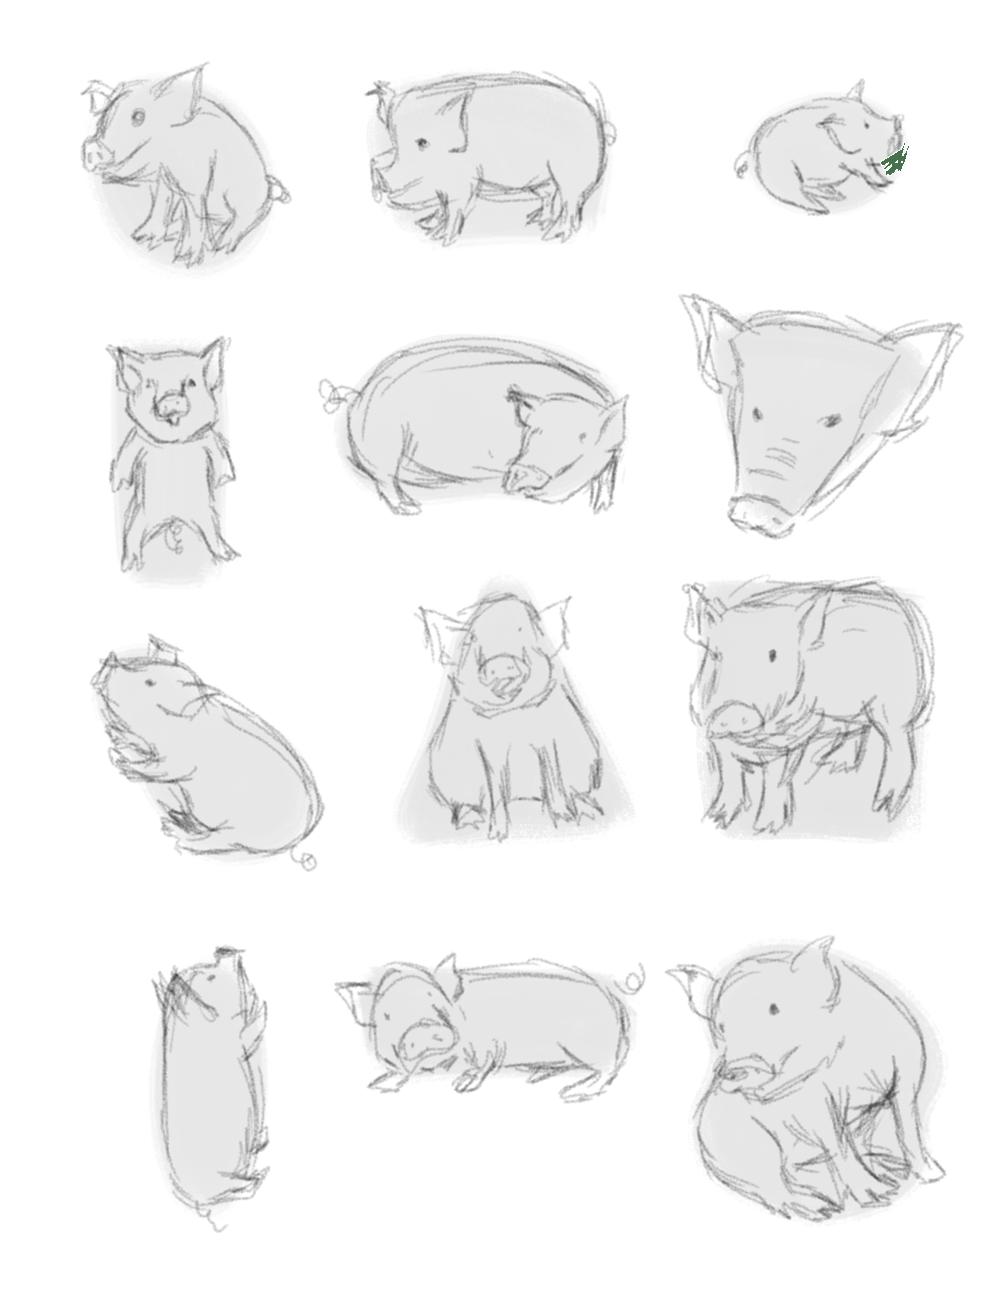 Piggy<3 - image 2 - student project